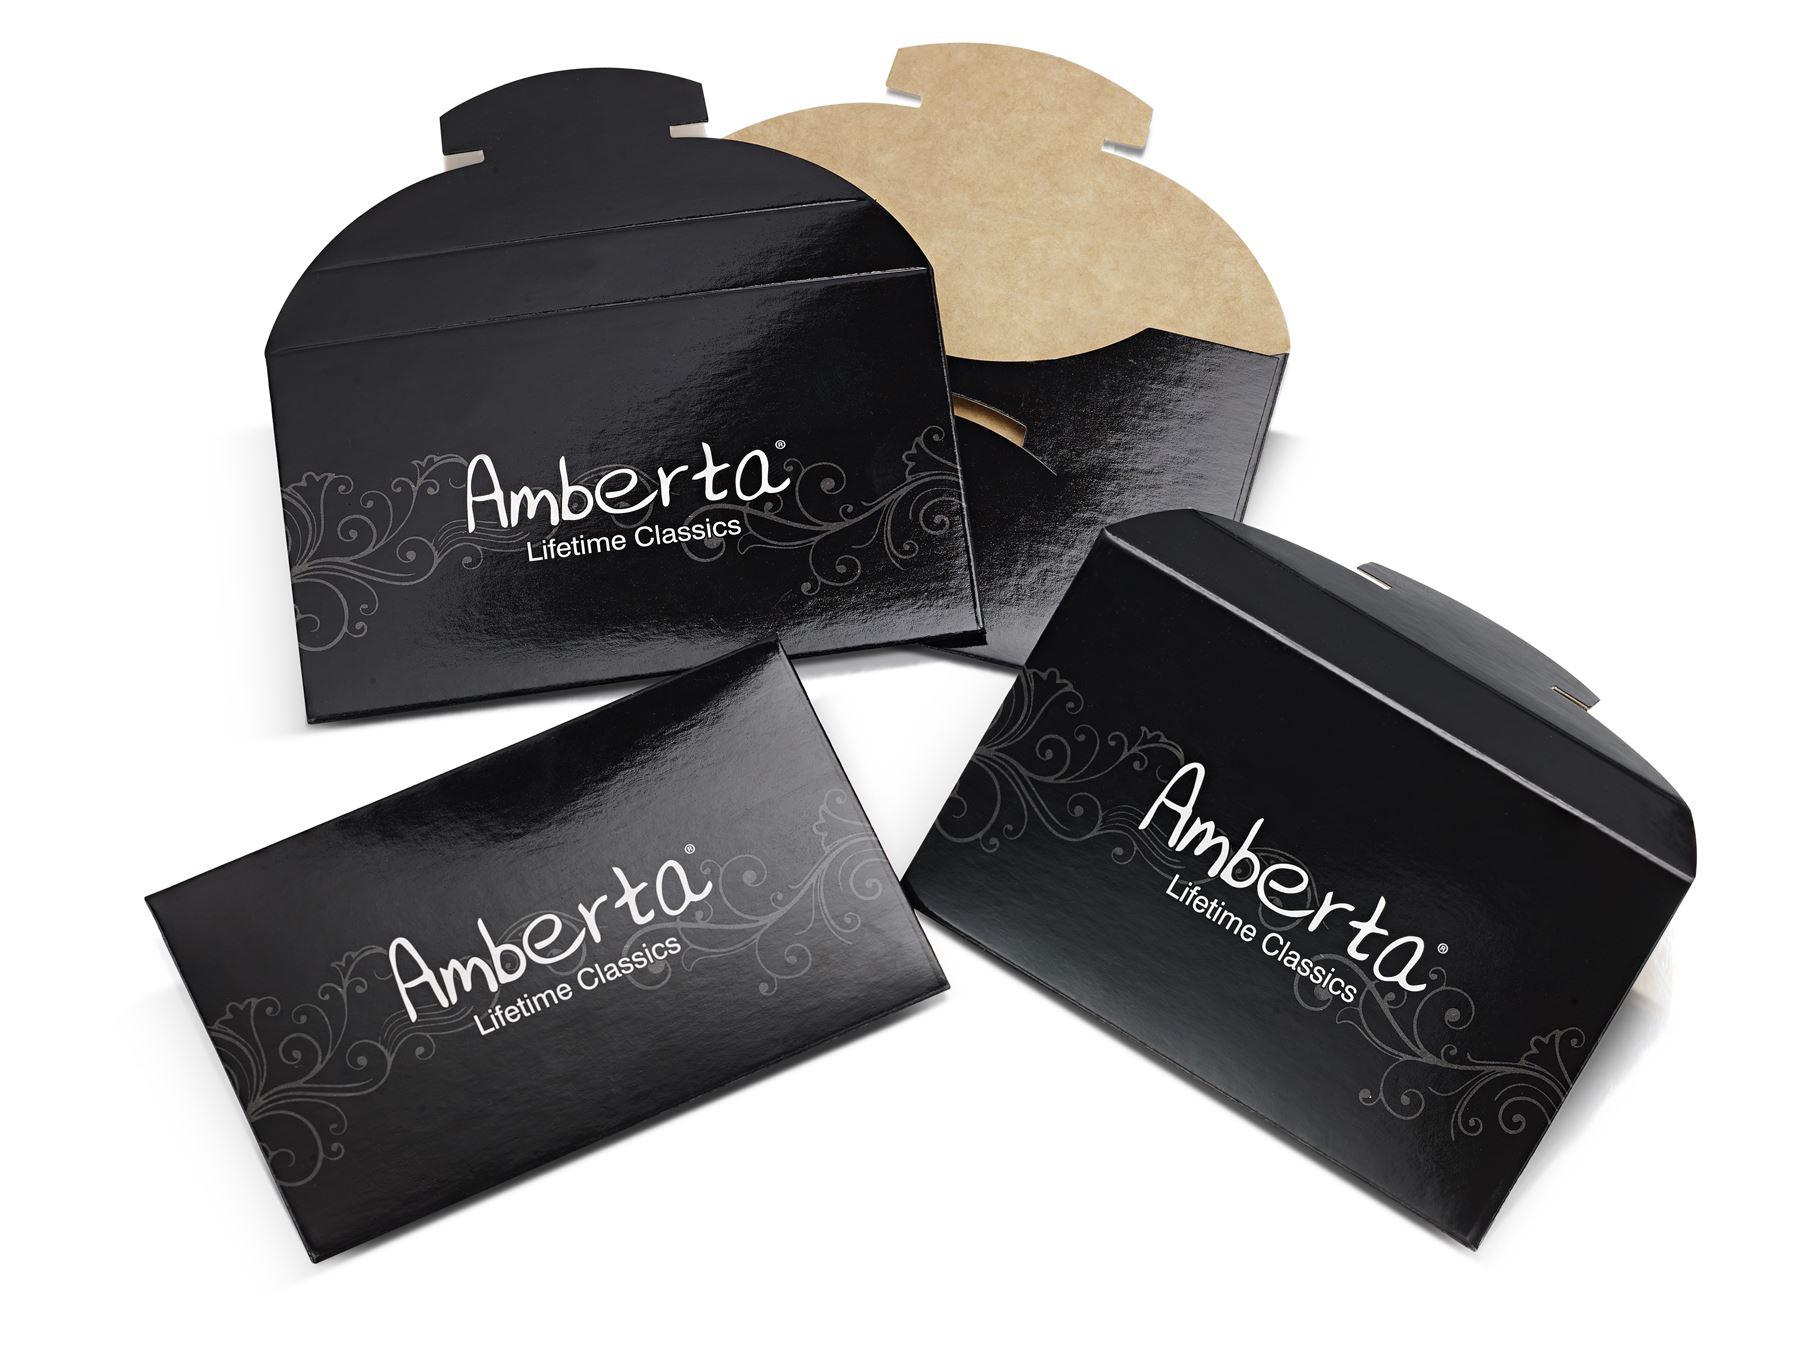 Amberta-Jewelry-925-Sterling-Silver-Adjustable-Bracelet-Italian-Bangle-for-Women thumbnail 46